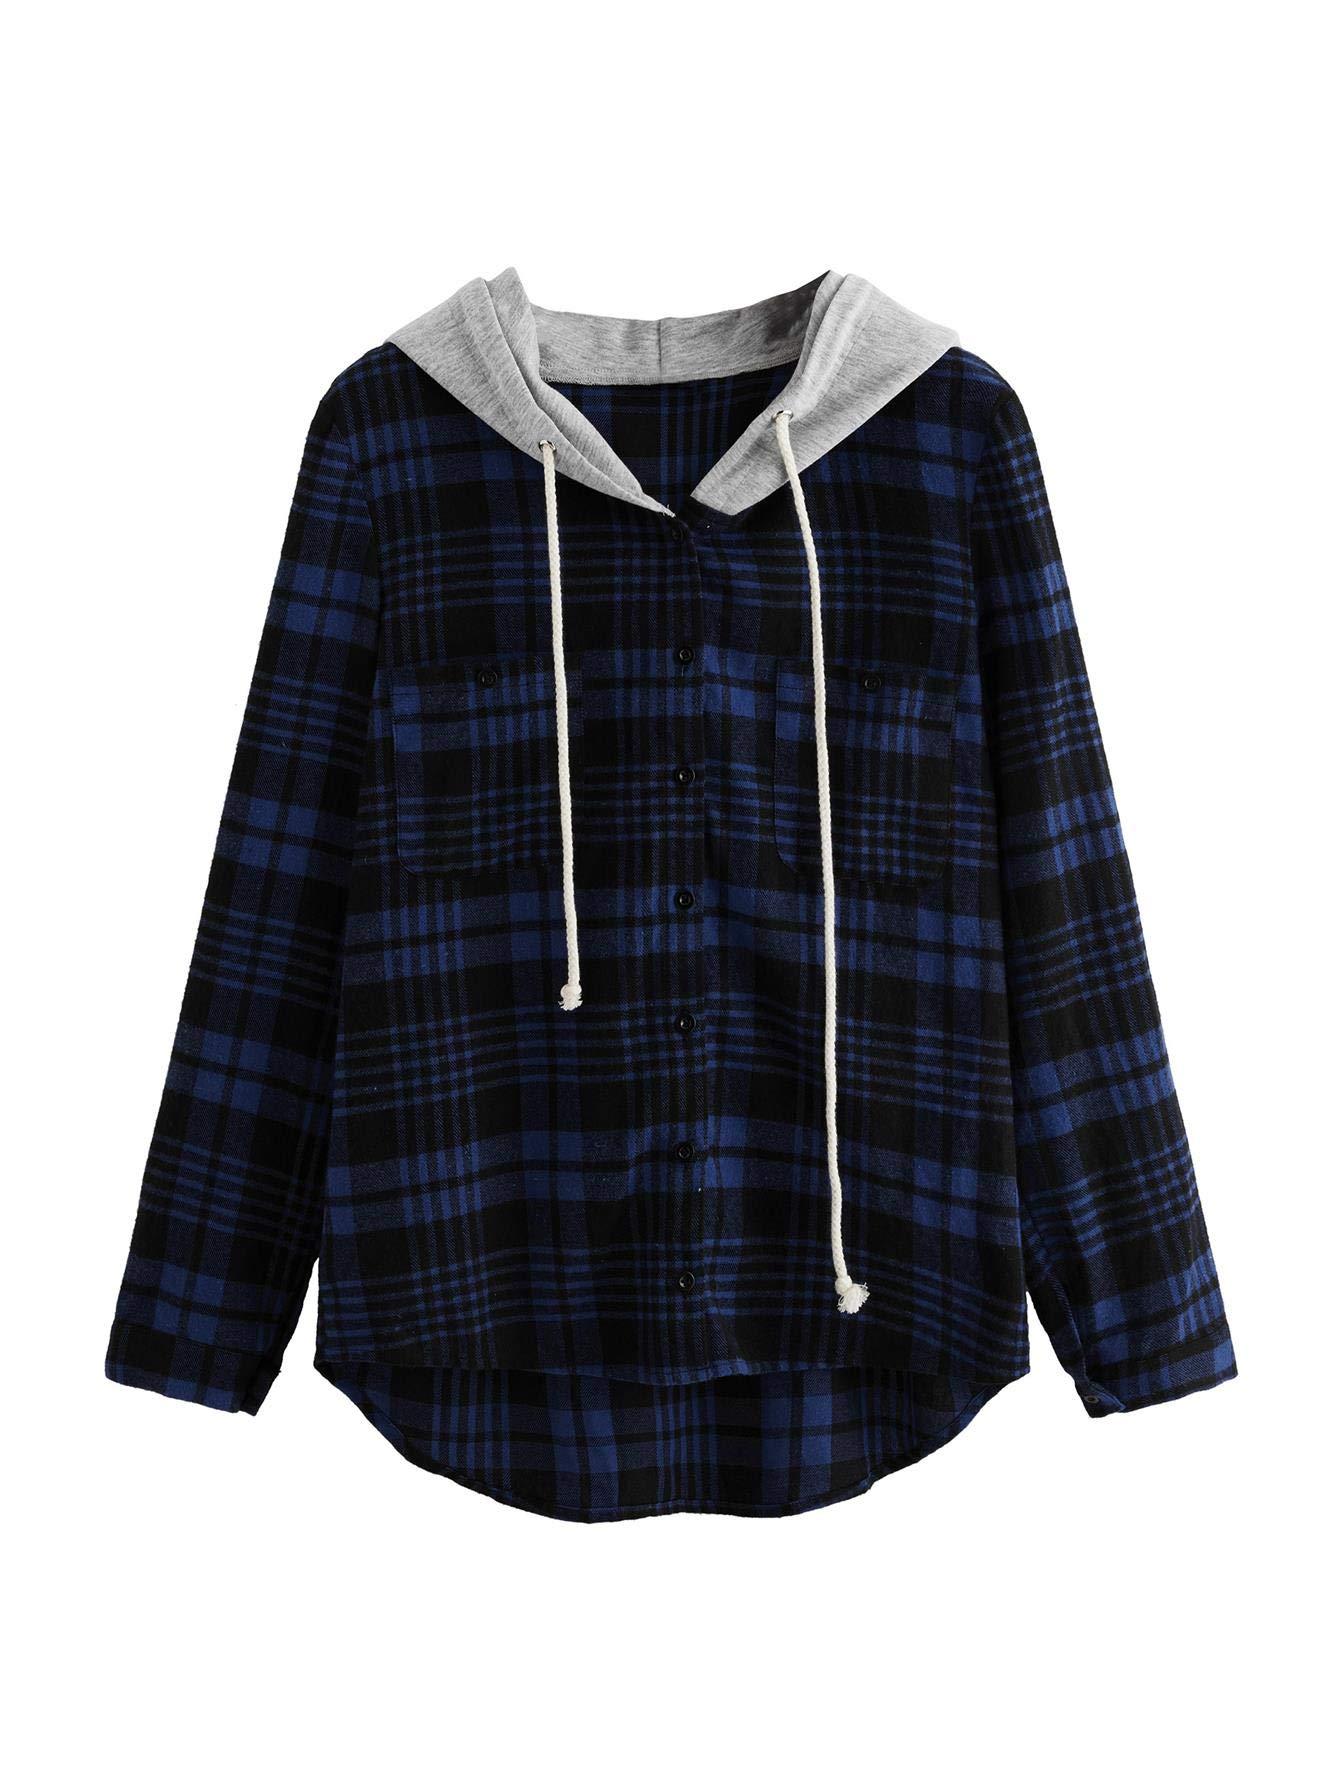 SweatyRocks Women's Casual Plaid Hoodie Shirt Long Sleeve Button-up Blouse Tops (Medium, Navy)